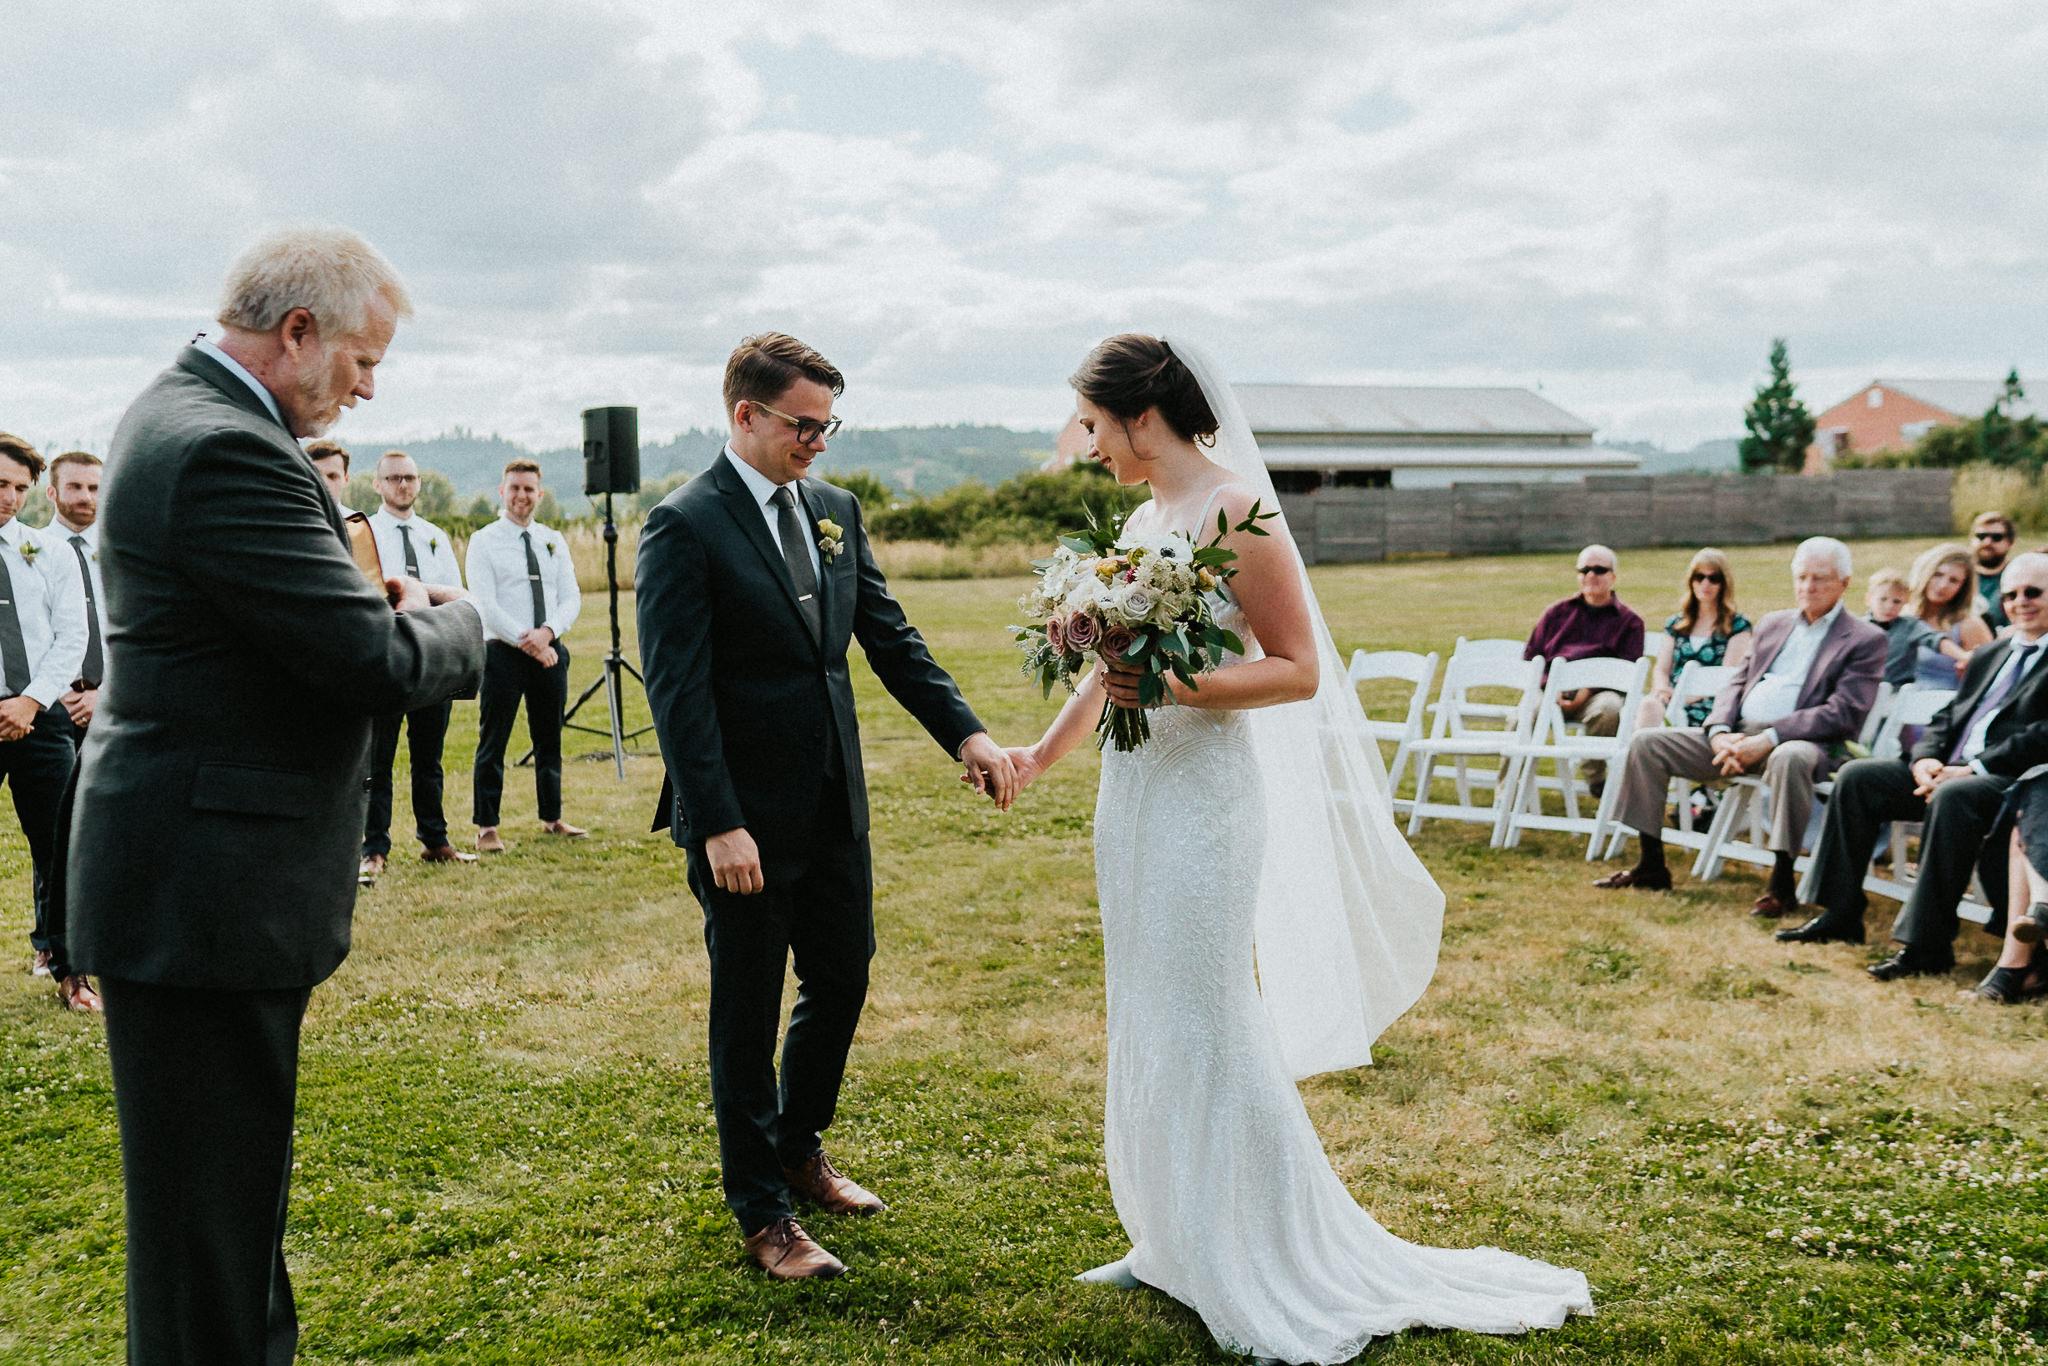 Groom receive bride Wedding Photography Alter Water Oasis venue